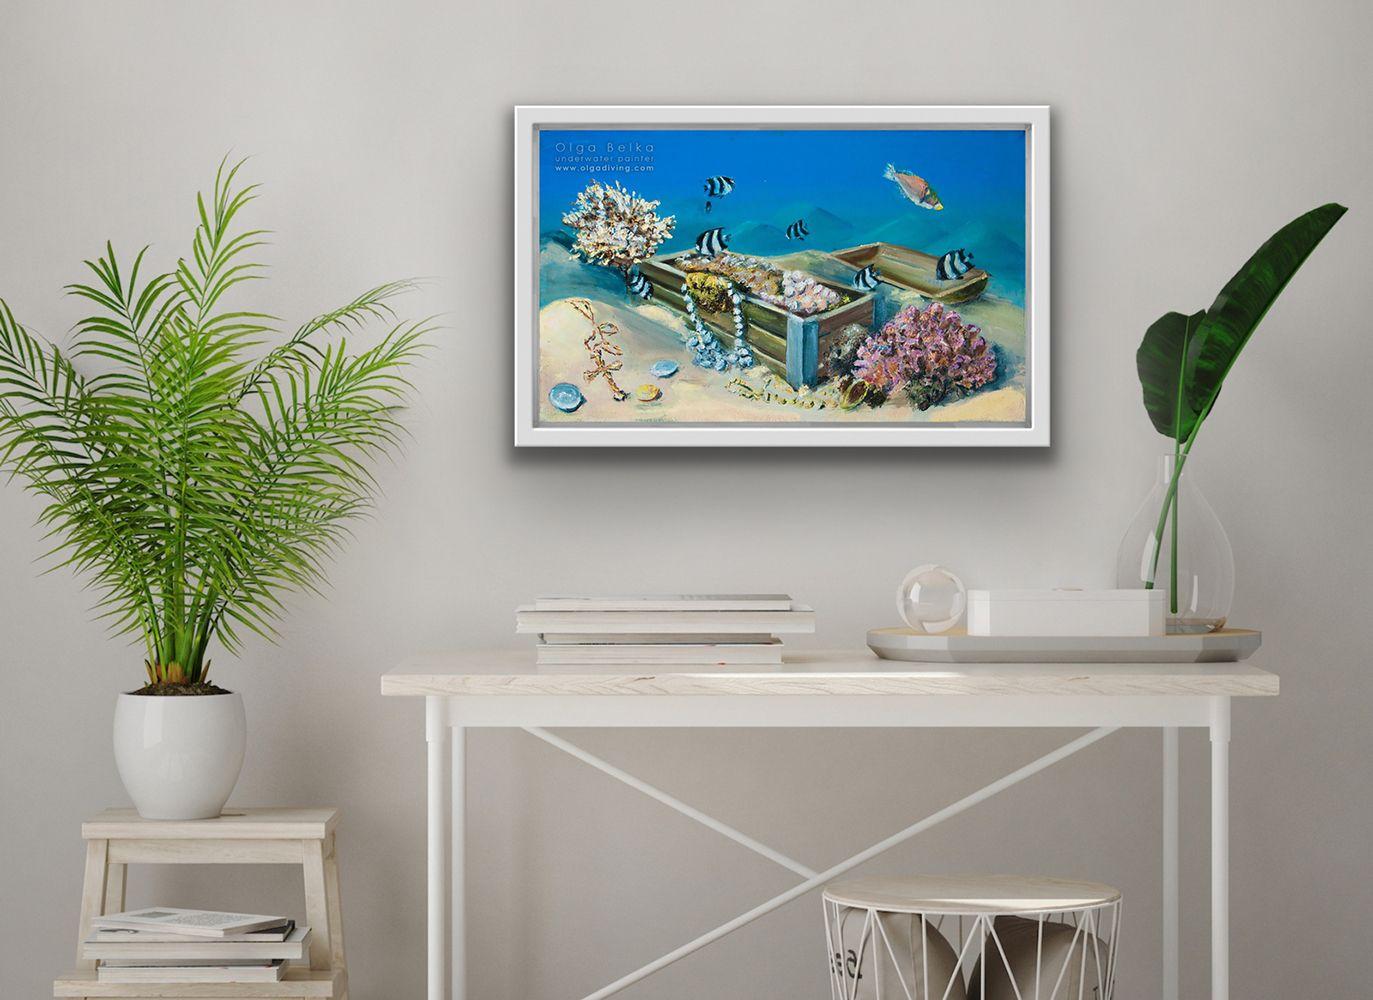 Chest with Fairy, Mixed media on canvas, 30 x 50 cm Worldwide Shipping, Link for order #artroomsapp #artportfolio #paintingsdaily #loveart #artroom #painting #artprojects #artspace #artroomdecor #artforeveryone #todaysart #studioart #livingroom #interiordesing #decoration #interior4you #artforsale #interiorstyling #home #interior4all #homestyle #interiorforyou #homedeco #interiordesign #homelovers #housedecoration #housedecor #homeinterior #homedesign #interiordecoration